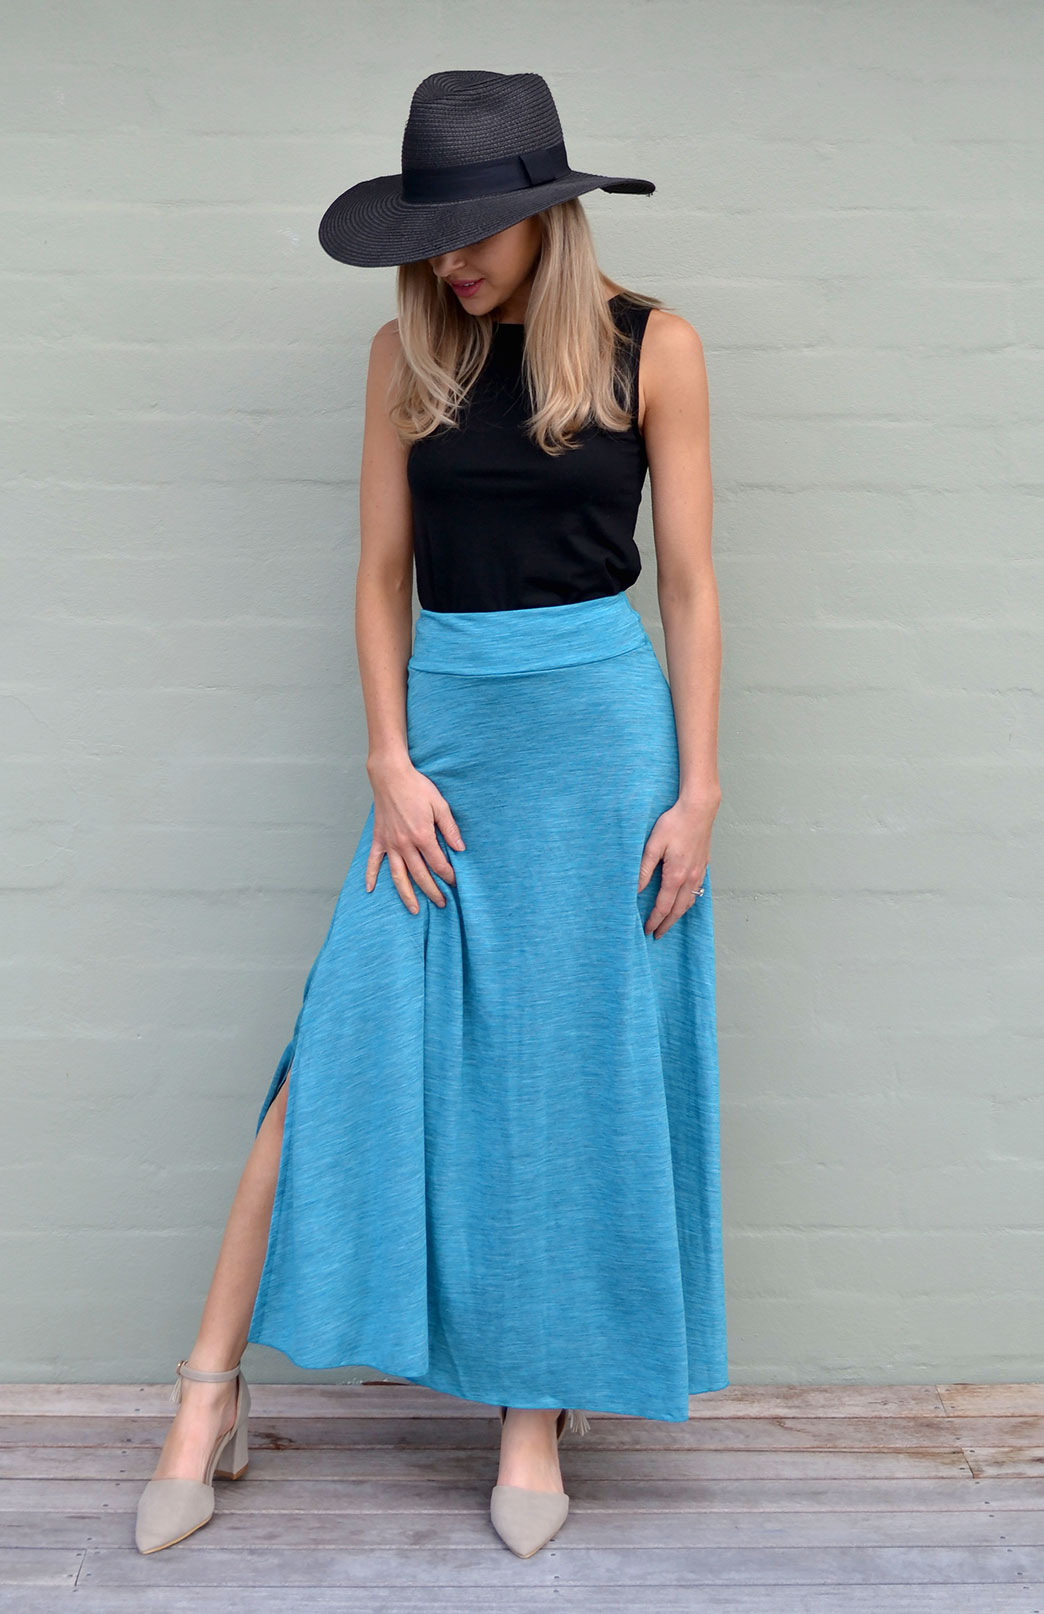 Marion Skirt - Women's Turquoise Pinstripe Merino Wool Blend Maxi Skirt - Smitten Merino Tasmania Australia